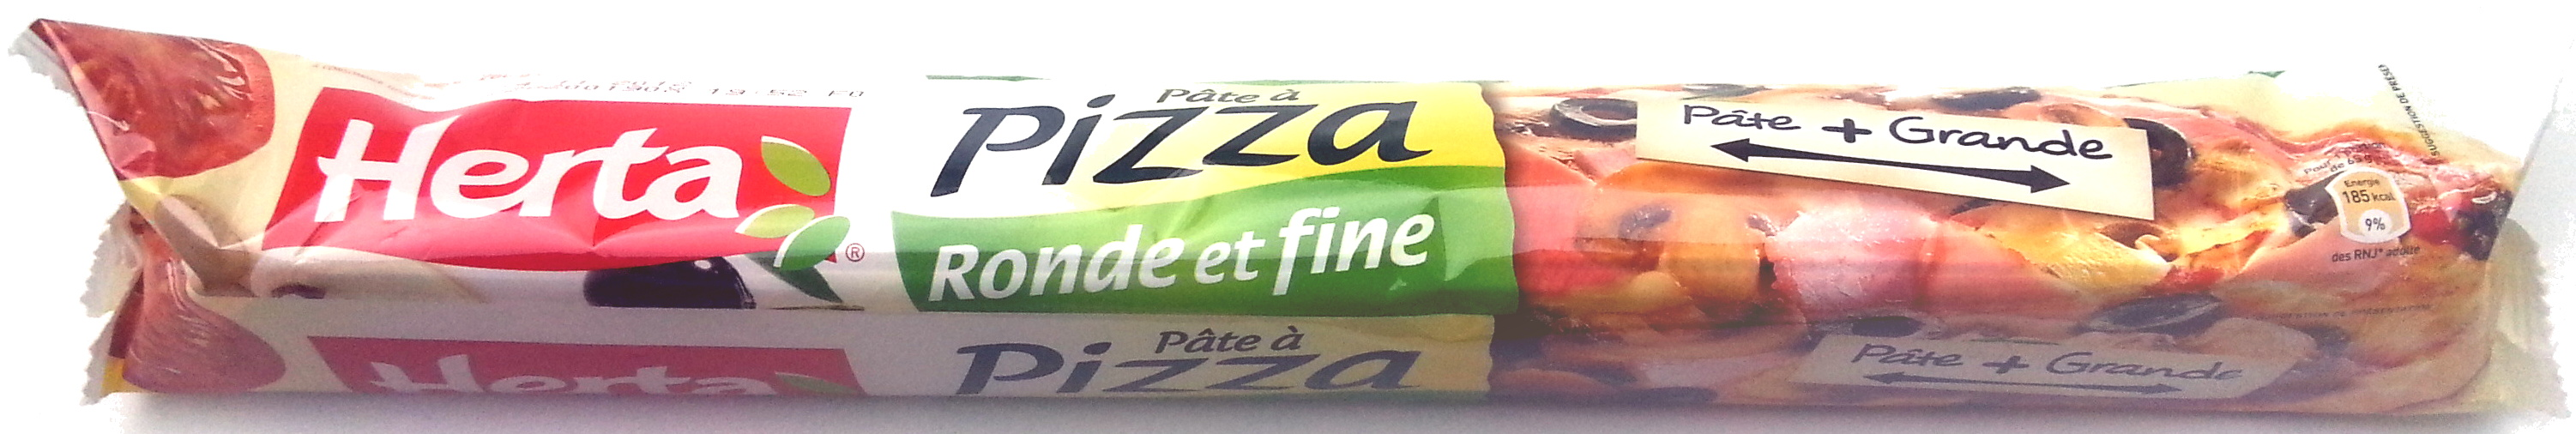 Tradizionale masa para pizza redonda fina y esponjosa - Product